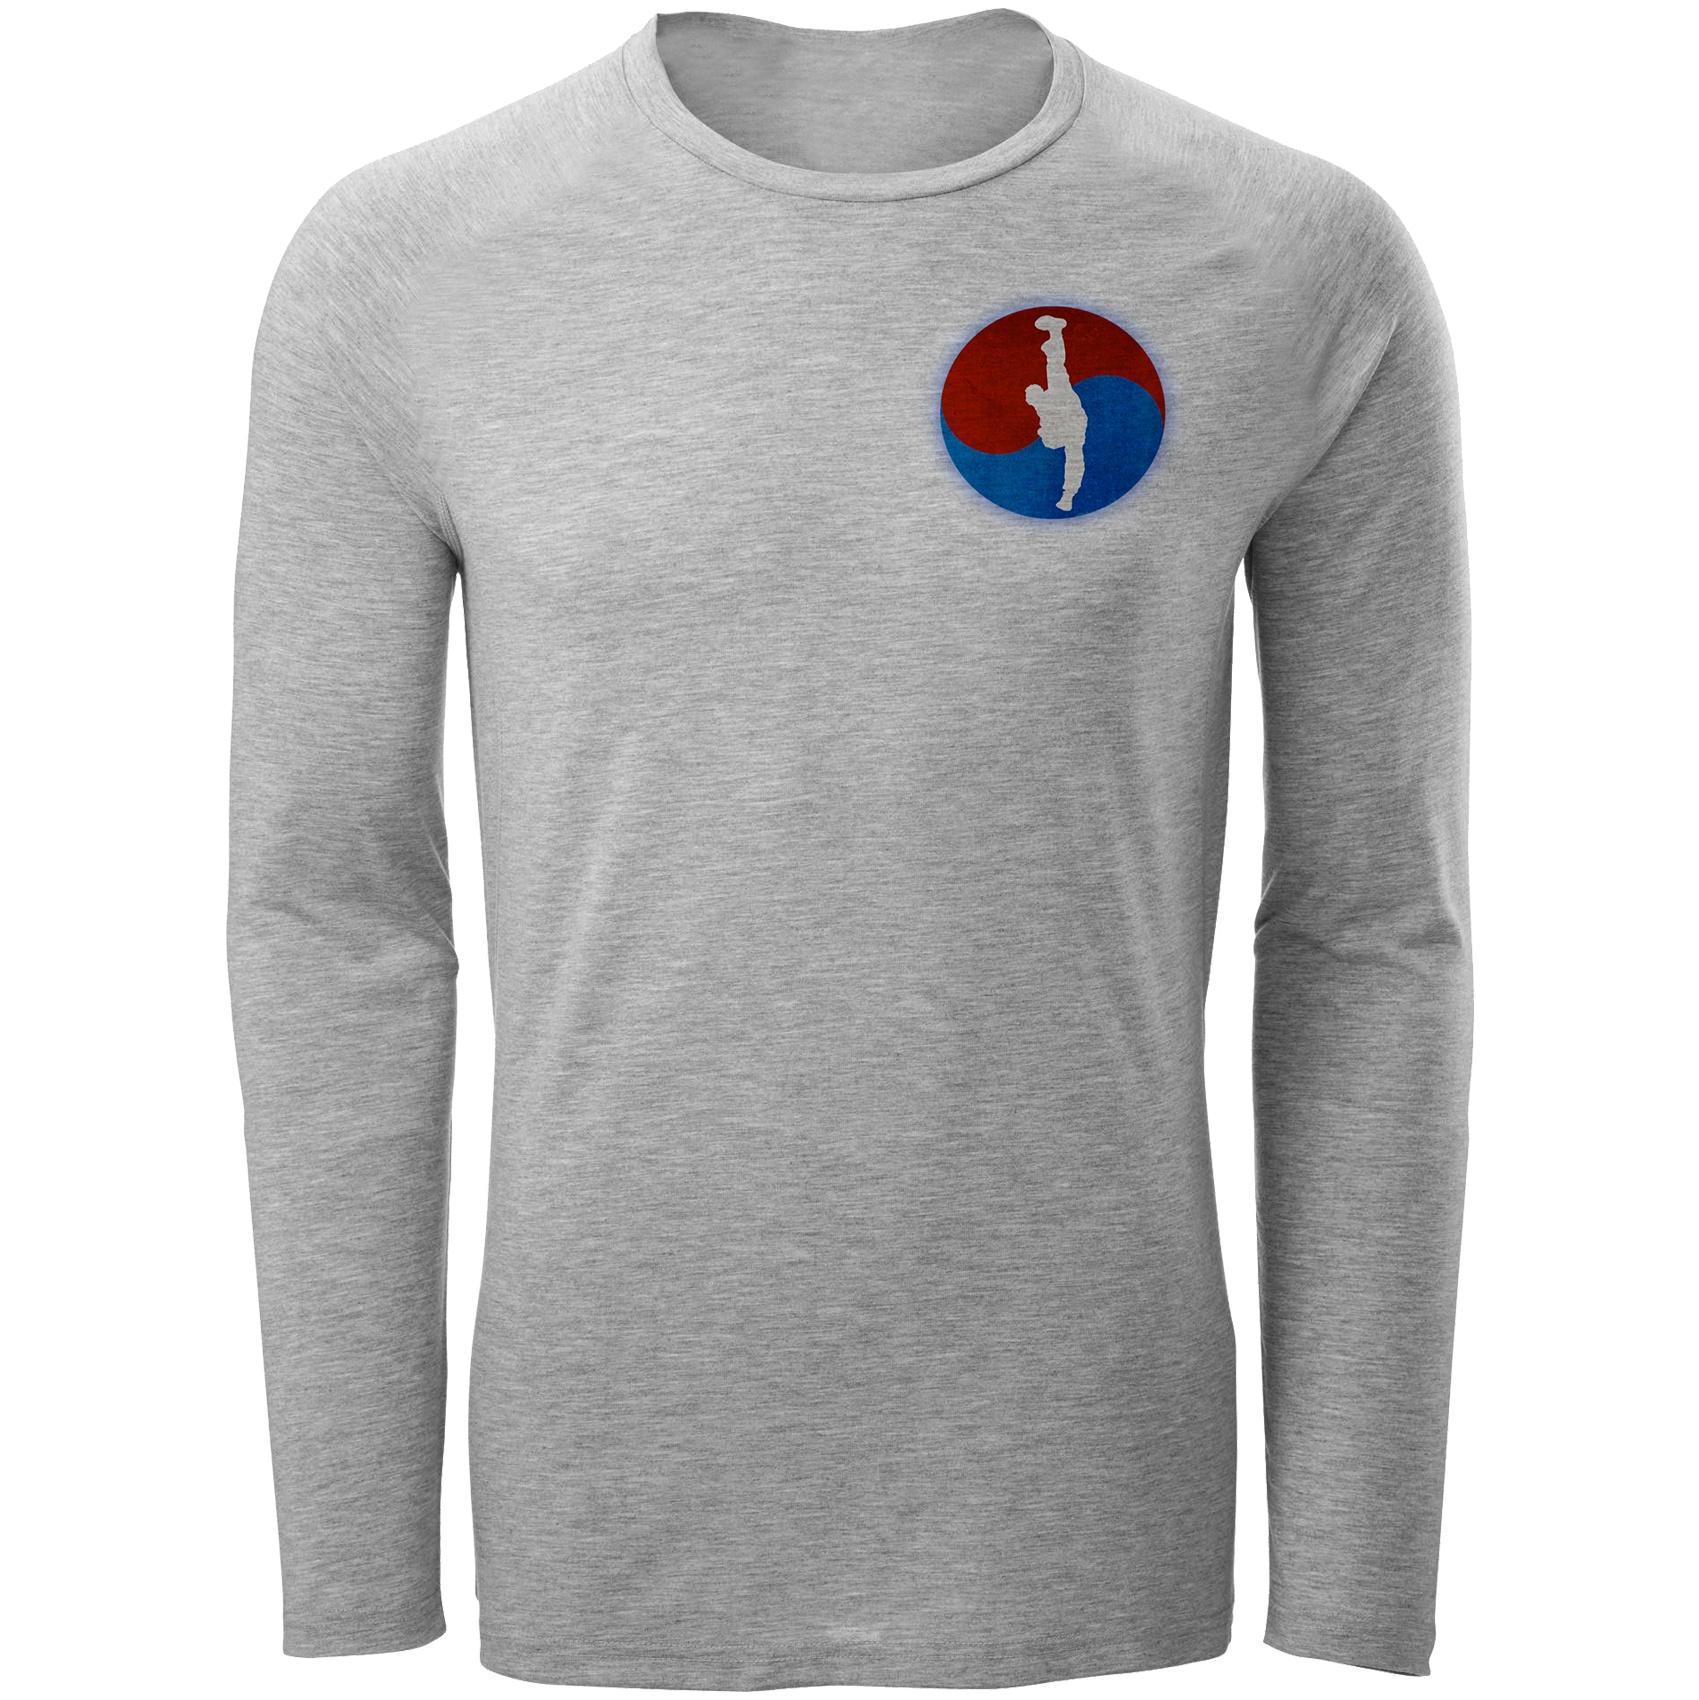 Photo of تی شرت آستین بلند مردانه طرح تکواندو کد C71